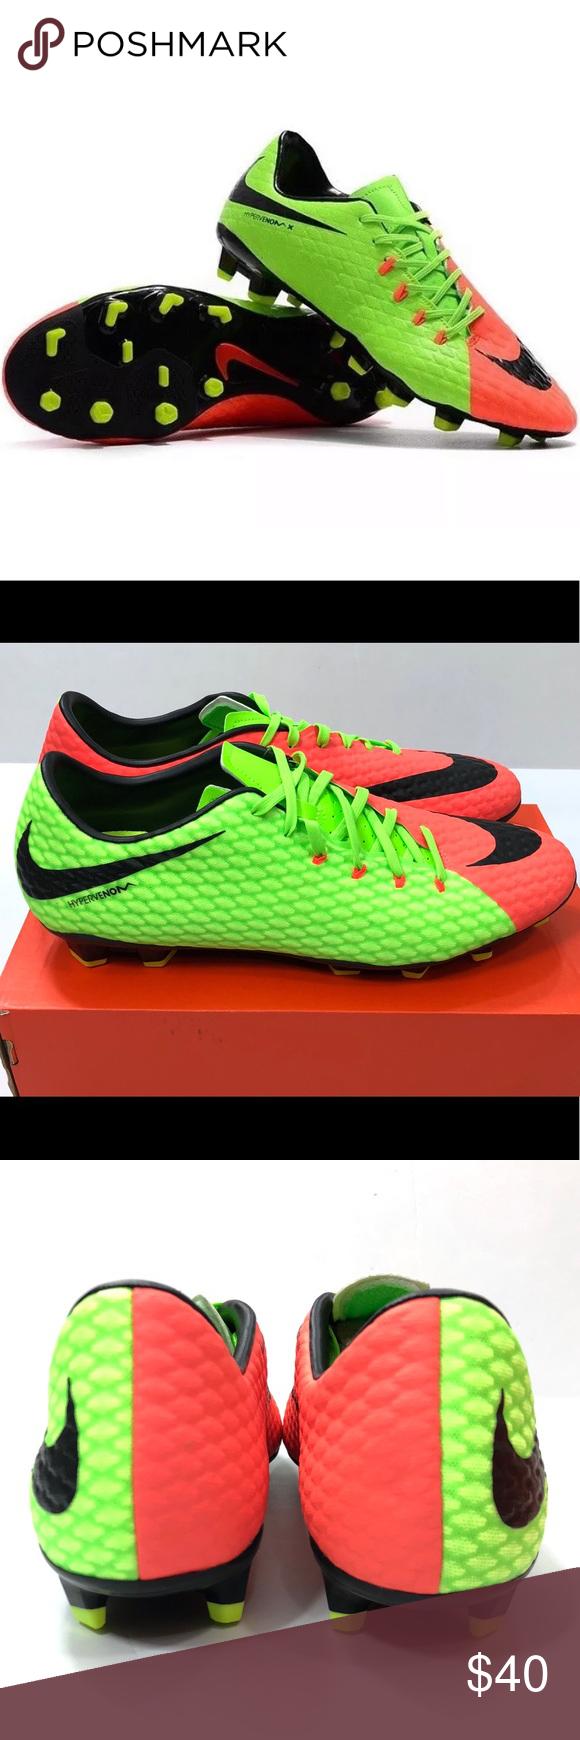 1aba86c84774 Nike Hypervenom Phelon III FG 852556-308 Cleats Brand  Nike Size  -10.5